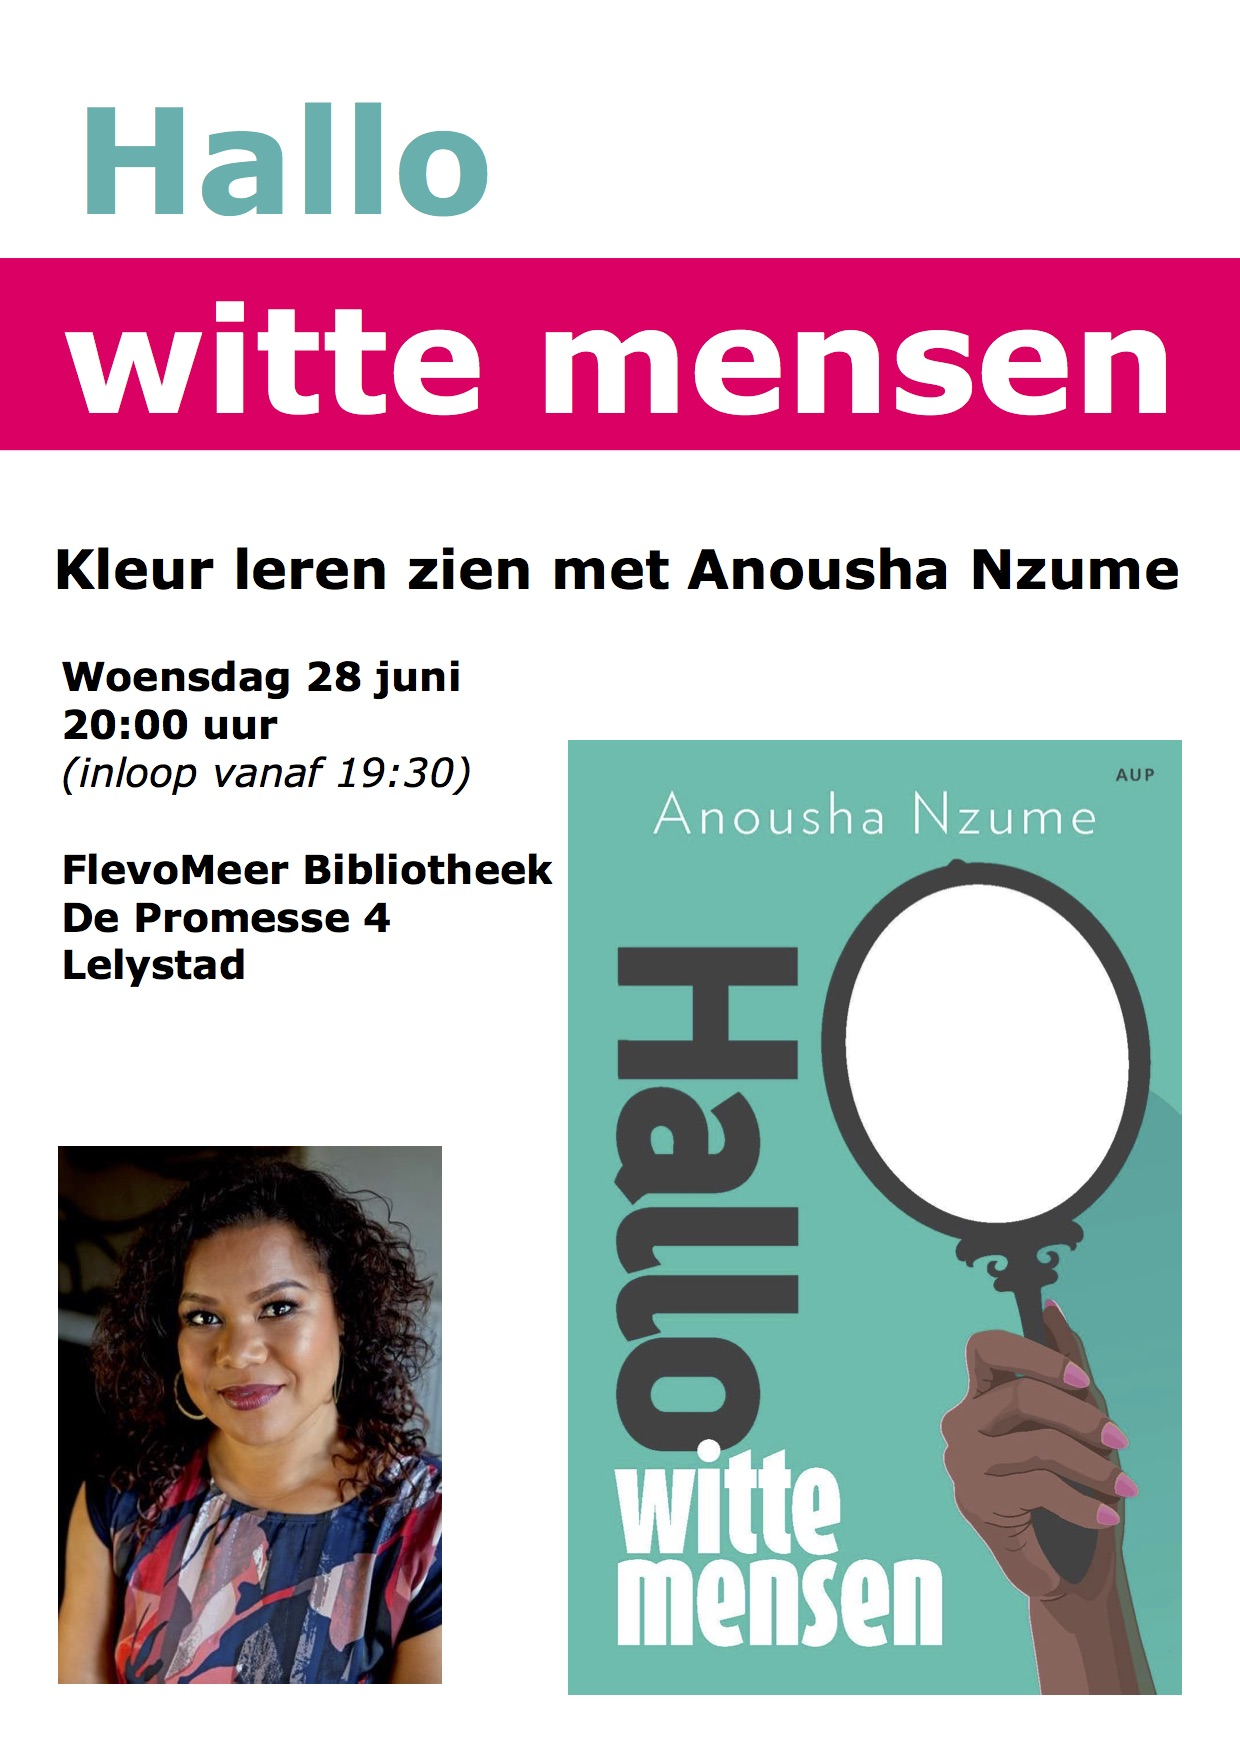 flyer voorkant anousha